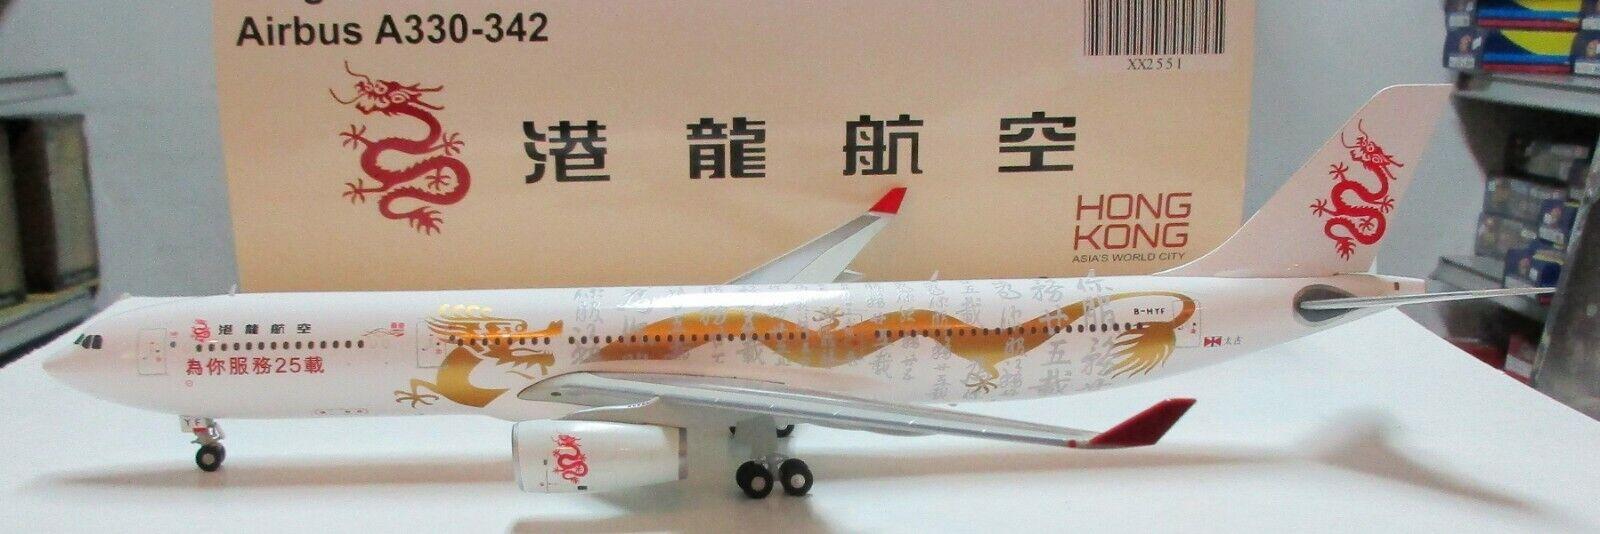 JC  Wings 1 200  -  Dragonair Airlines  A330-300    B-HYF  -  XX2551